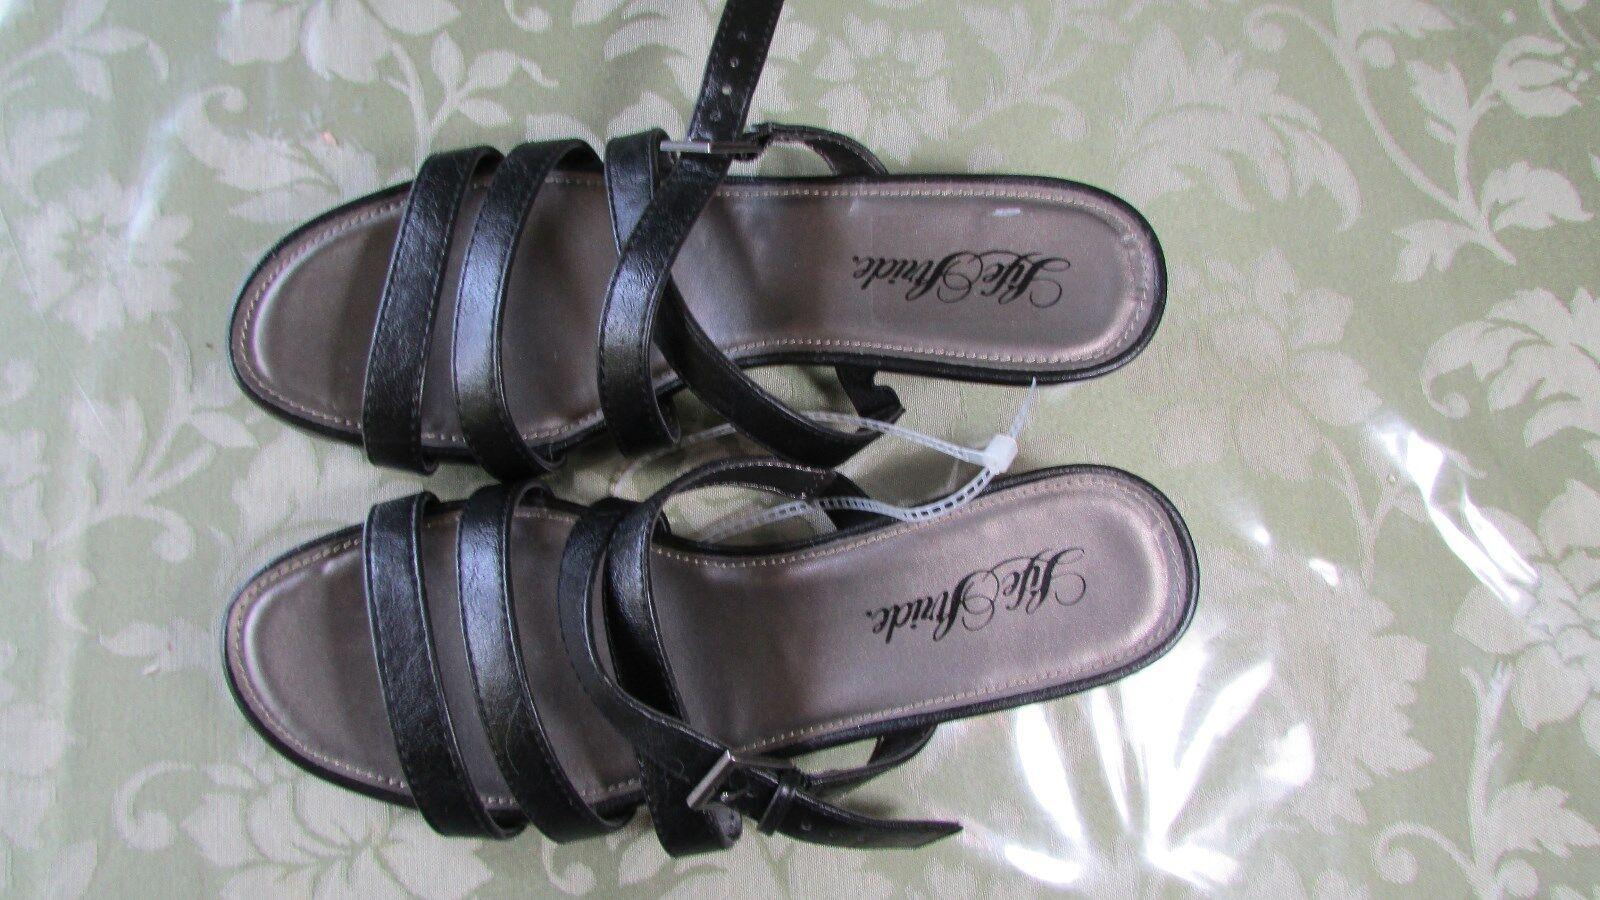 New Life Stride Women's 7.5M Slides Slip On Sandals 6.5M 7.5M Women's 8.5M 730c6f